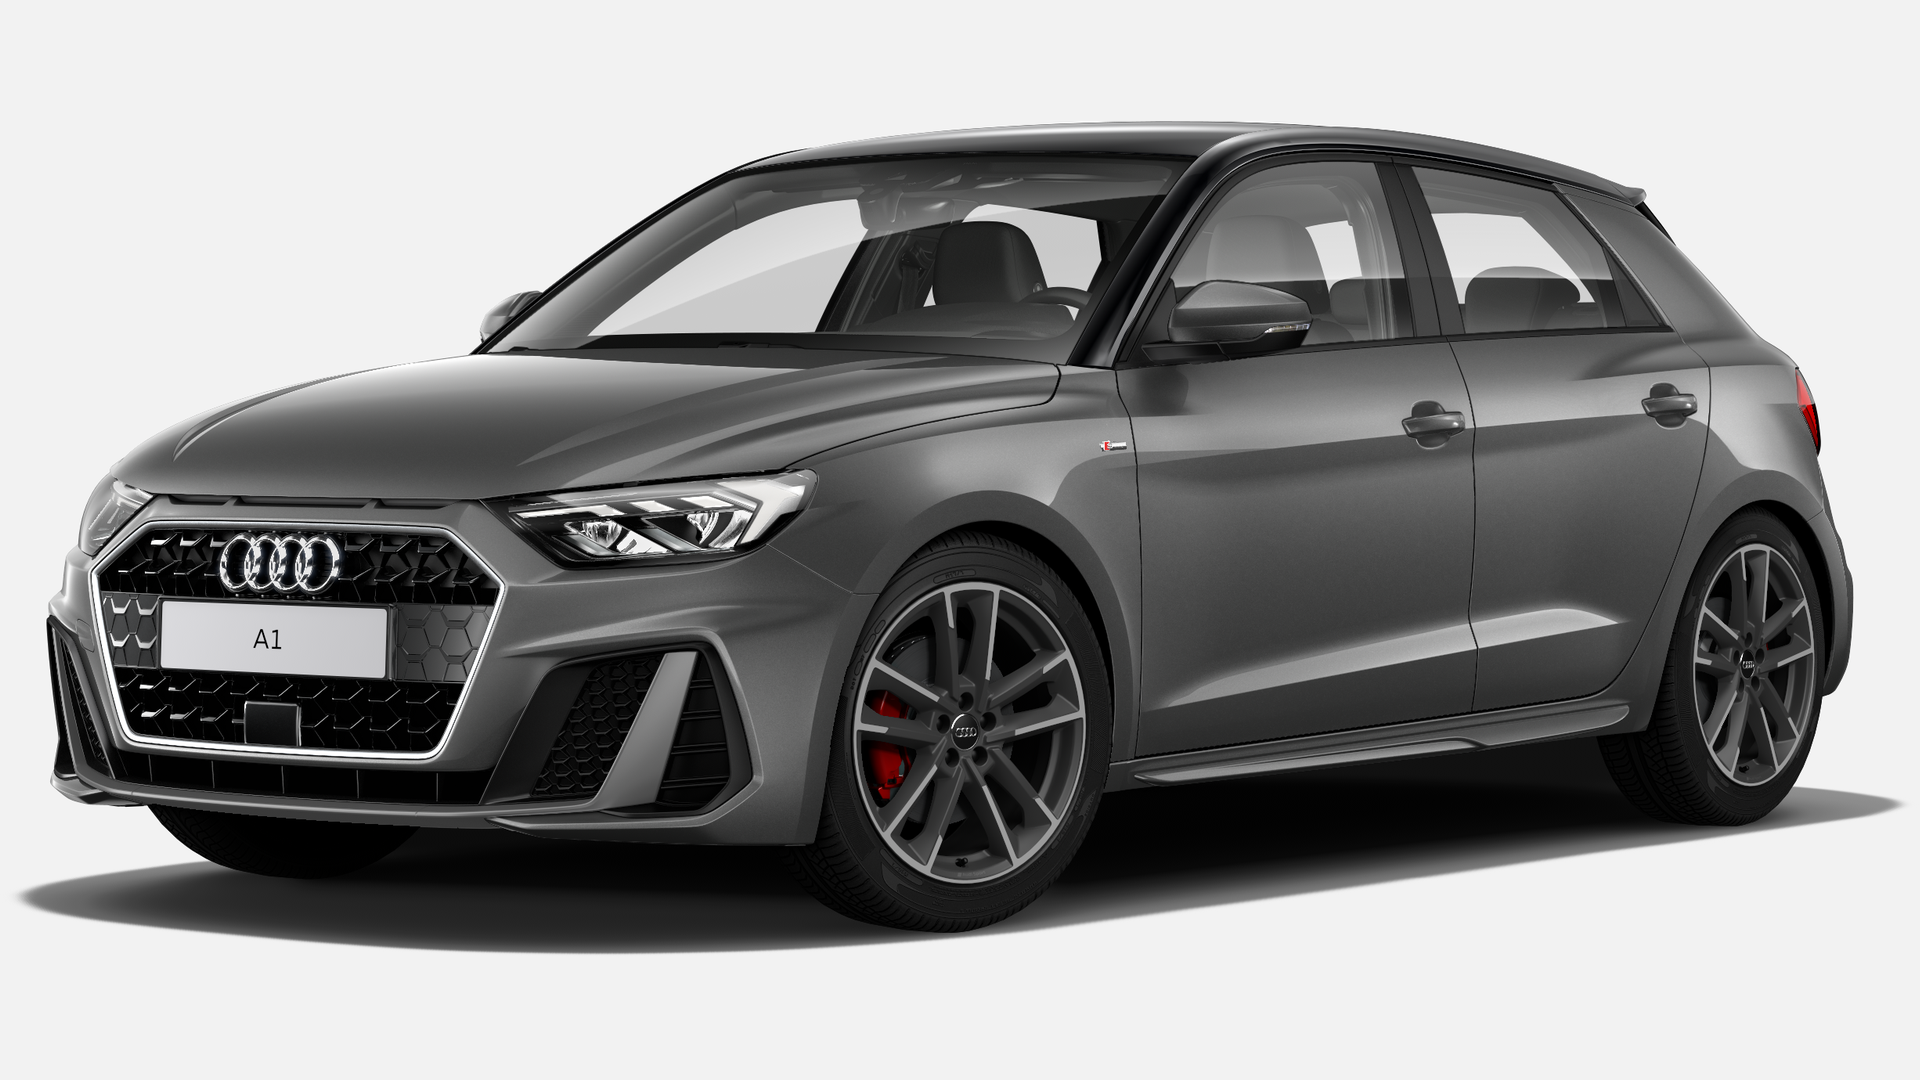 Audi A1 Sportback 30 TFSI S Line  85 kW (116 CV)  nuevo en Lugo